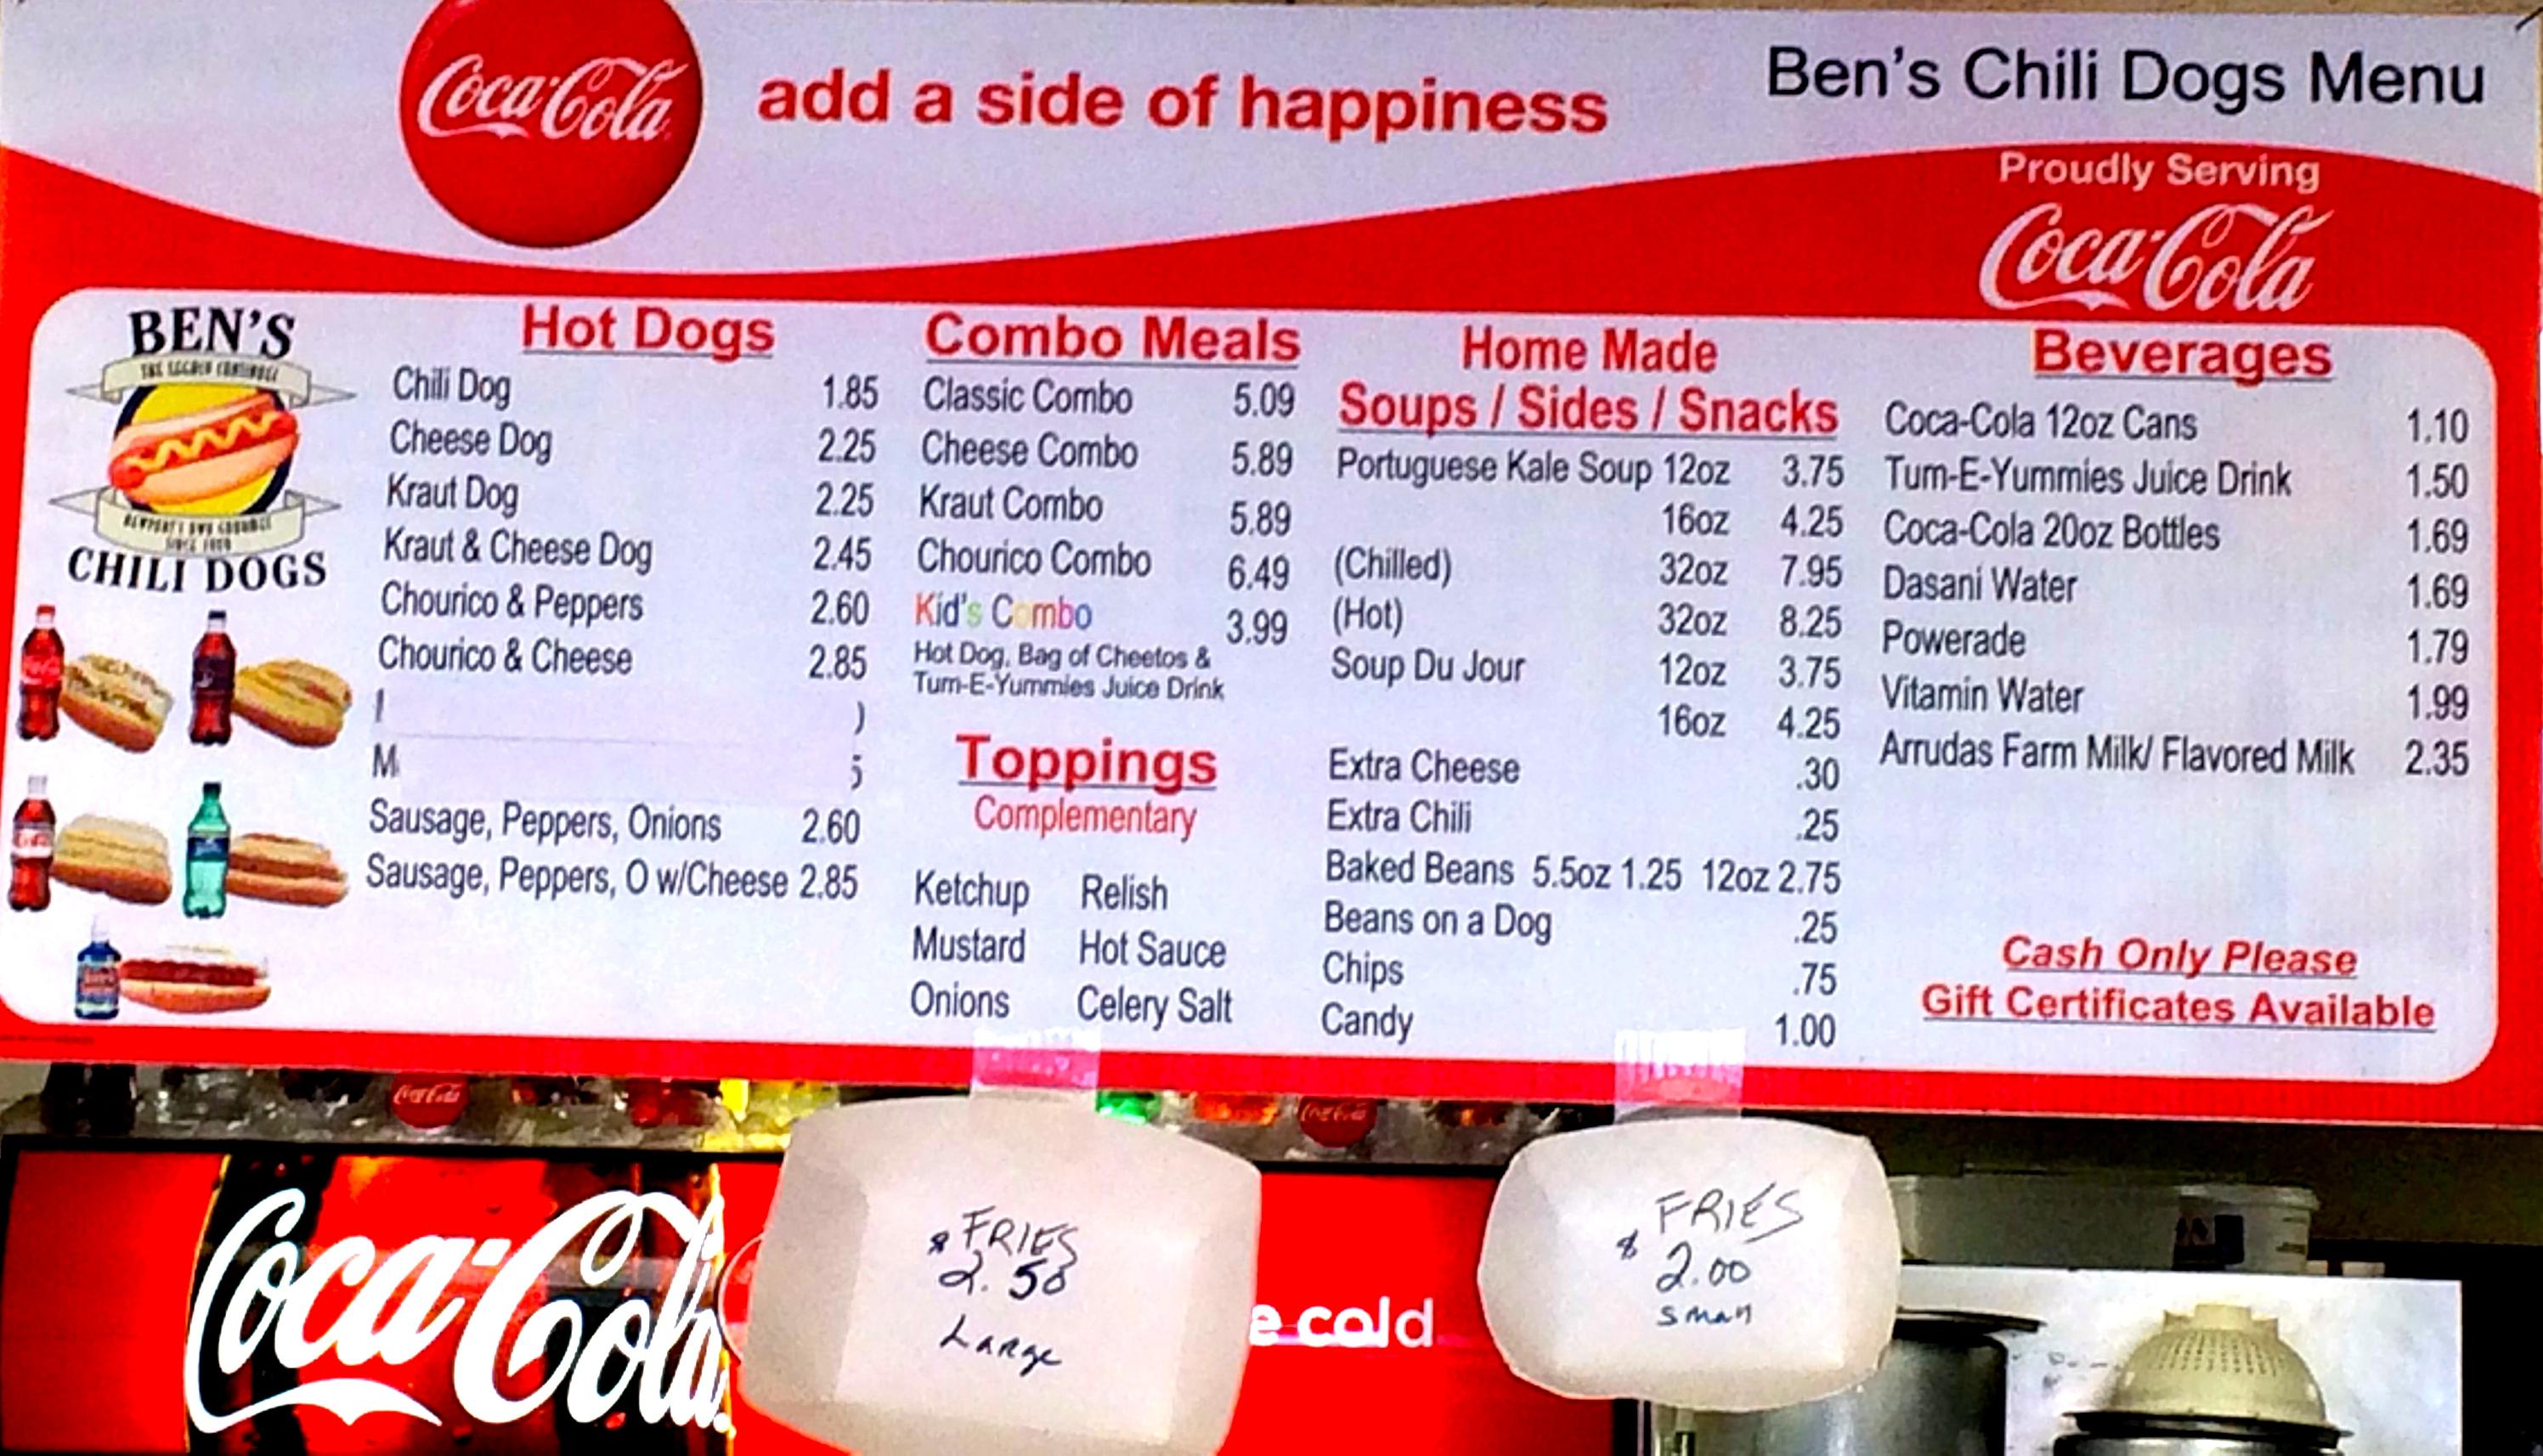 Ben's Chili Dogs menu